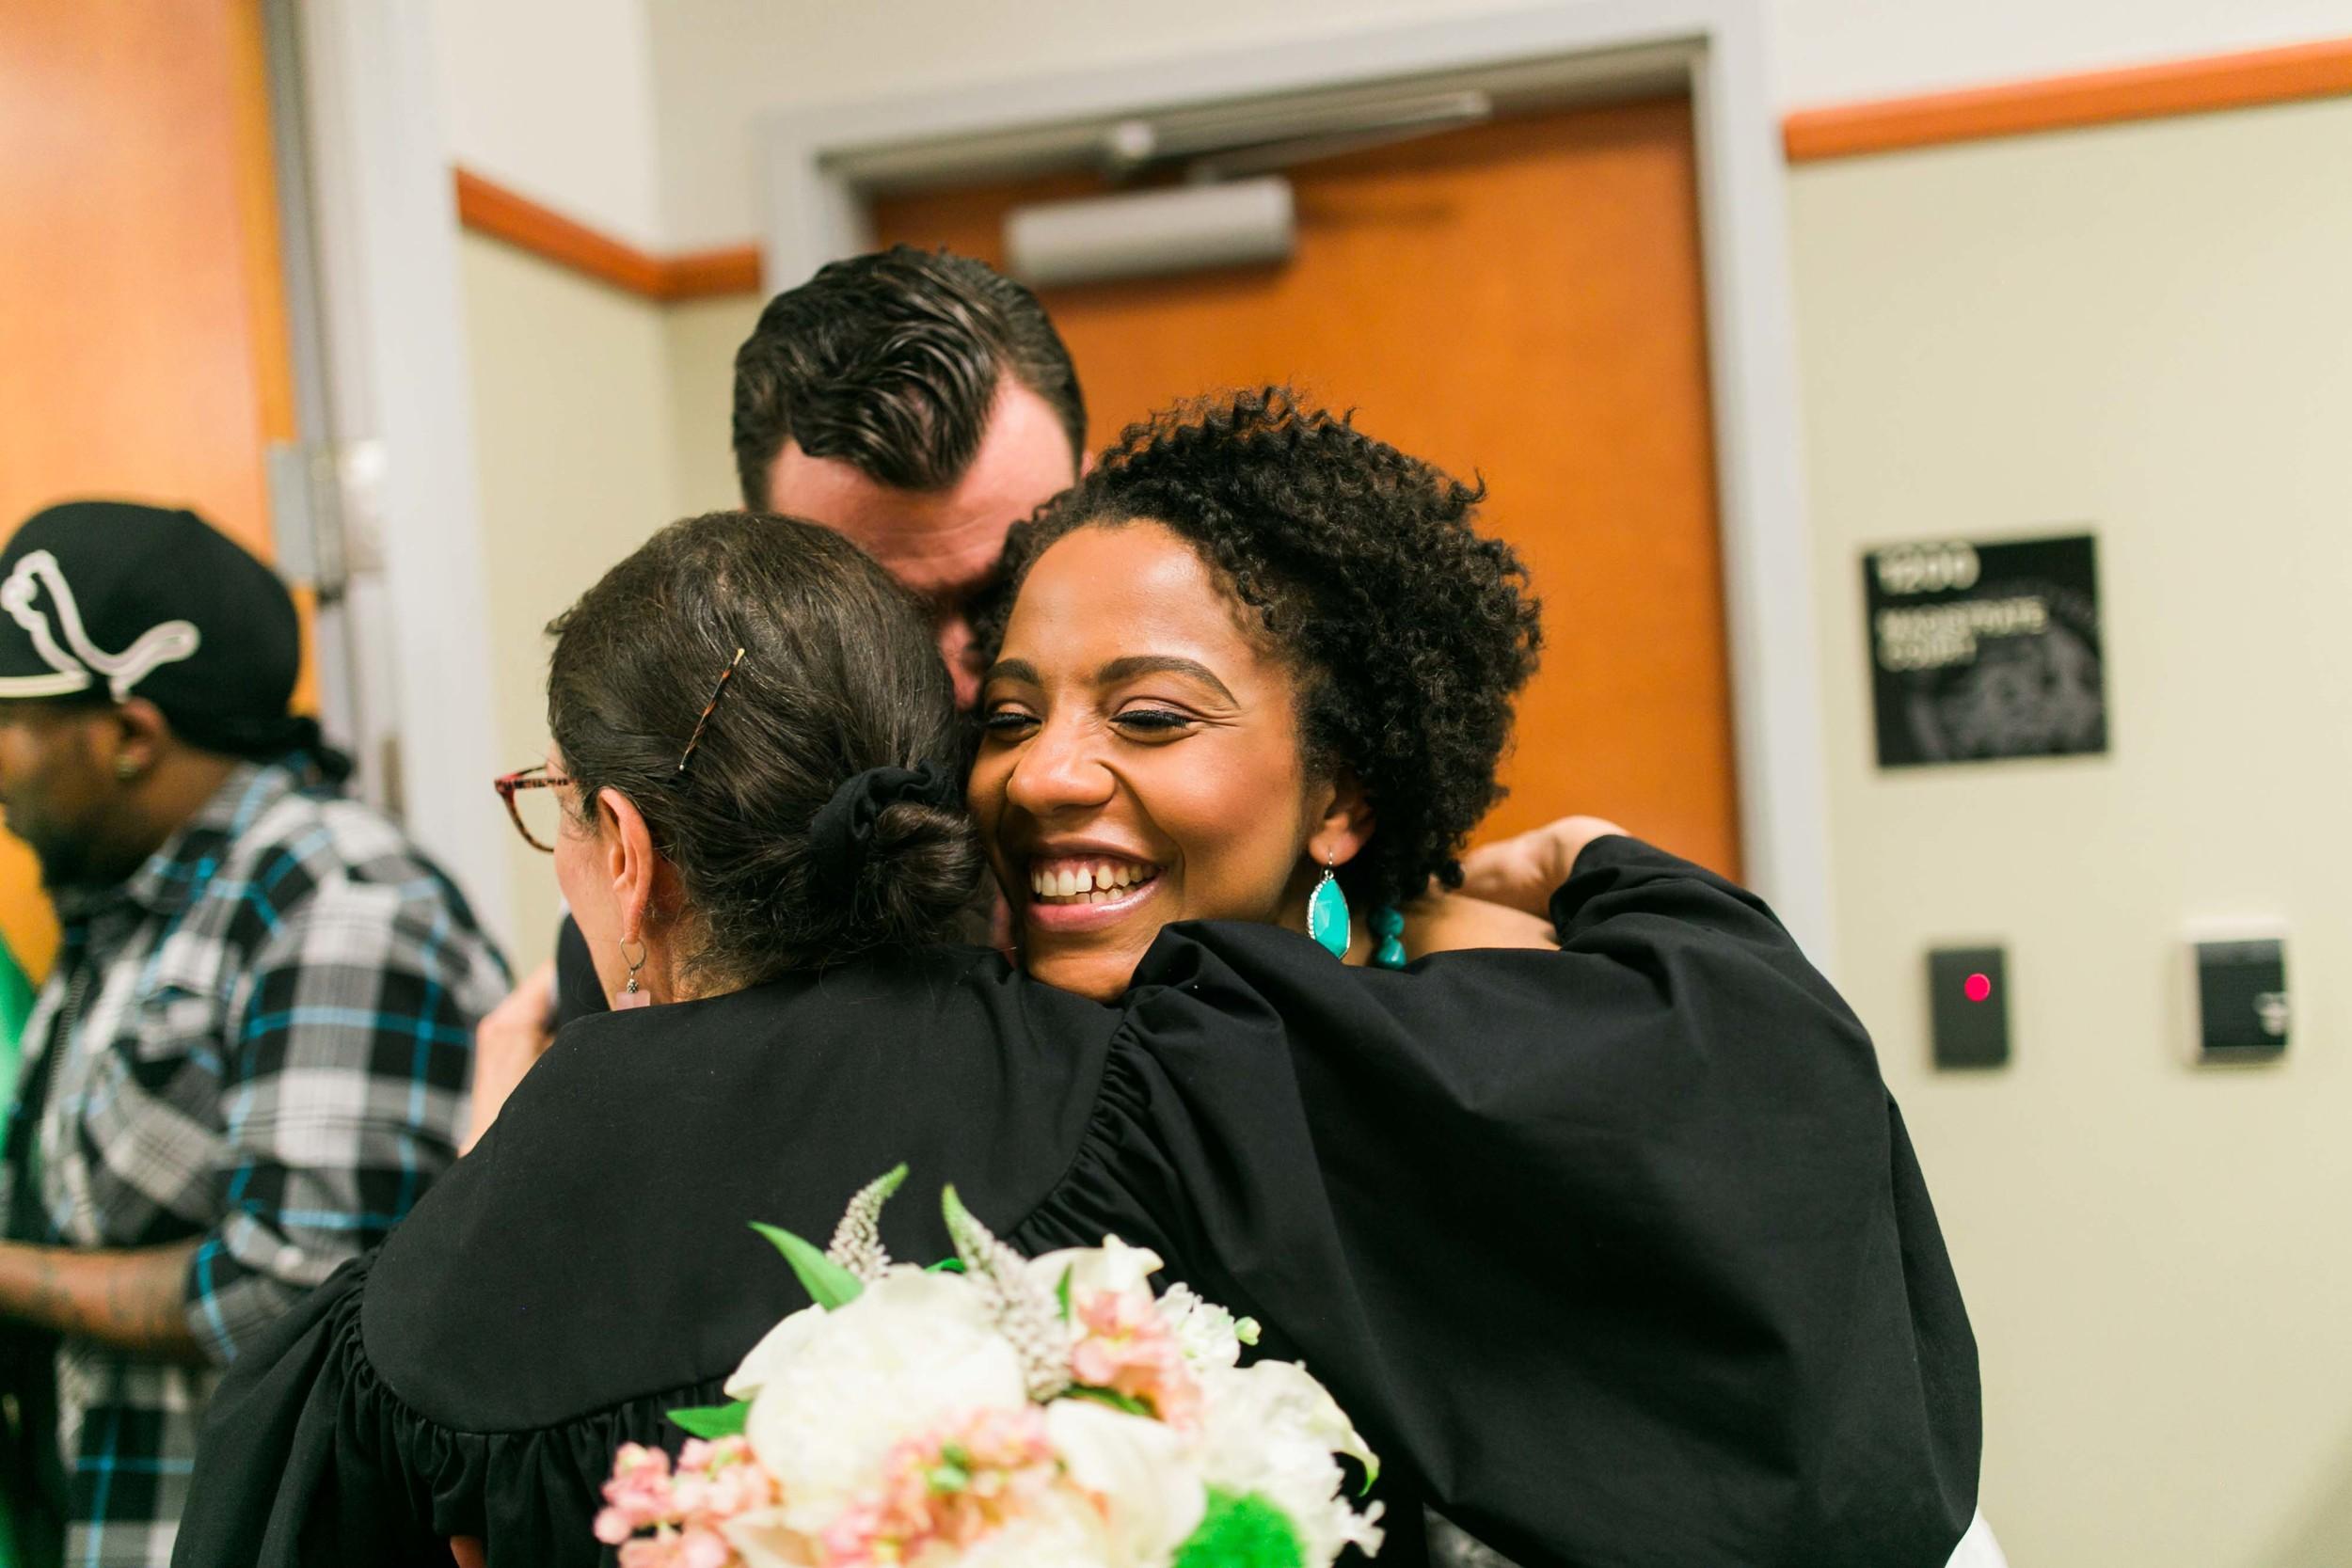 Dekalb-County-Courthouse-Wedding-Photos-Kiyah-C-Photography-35.jpg